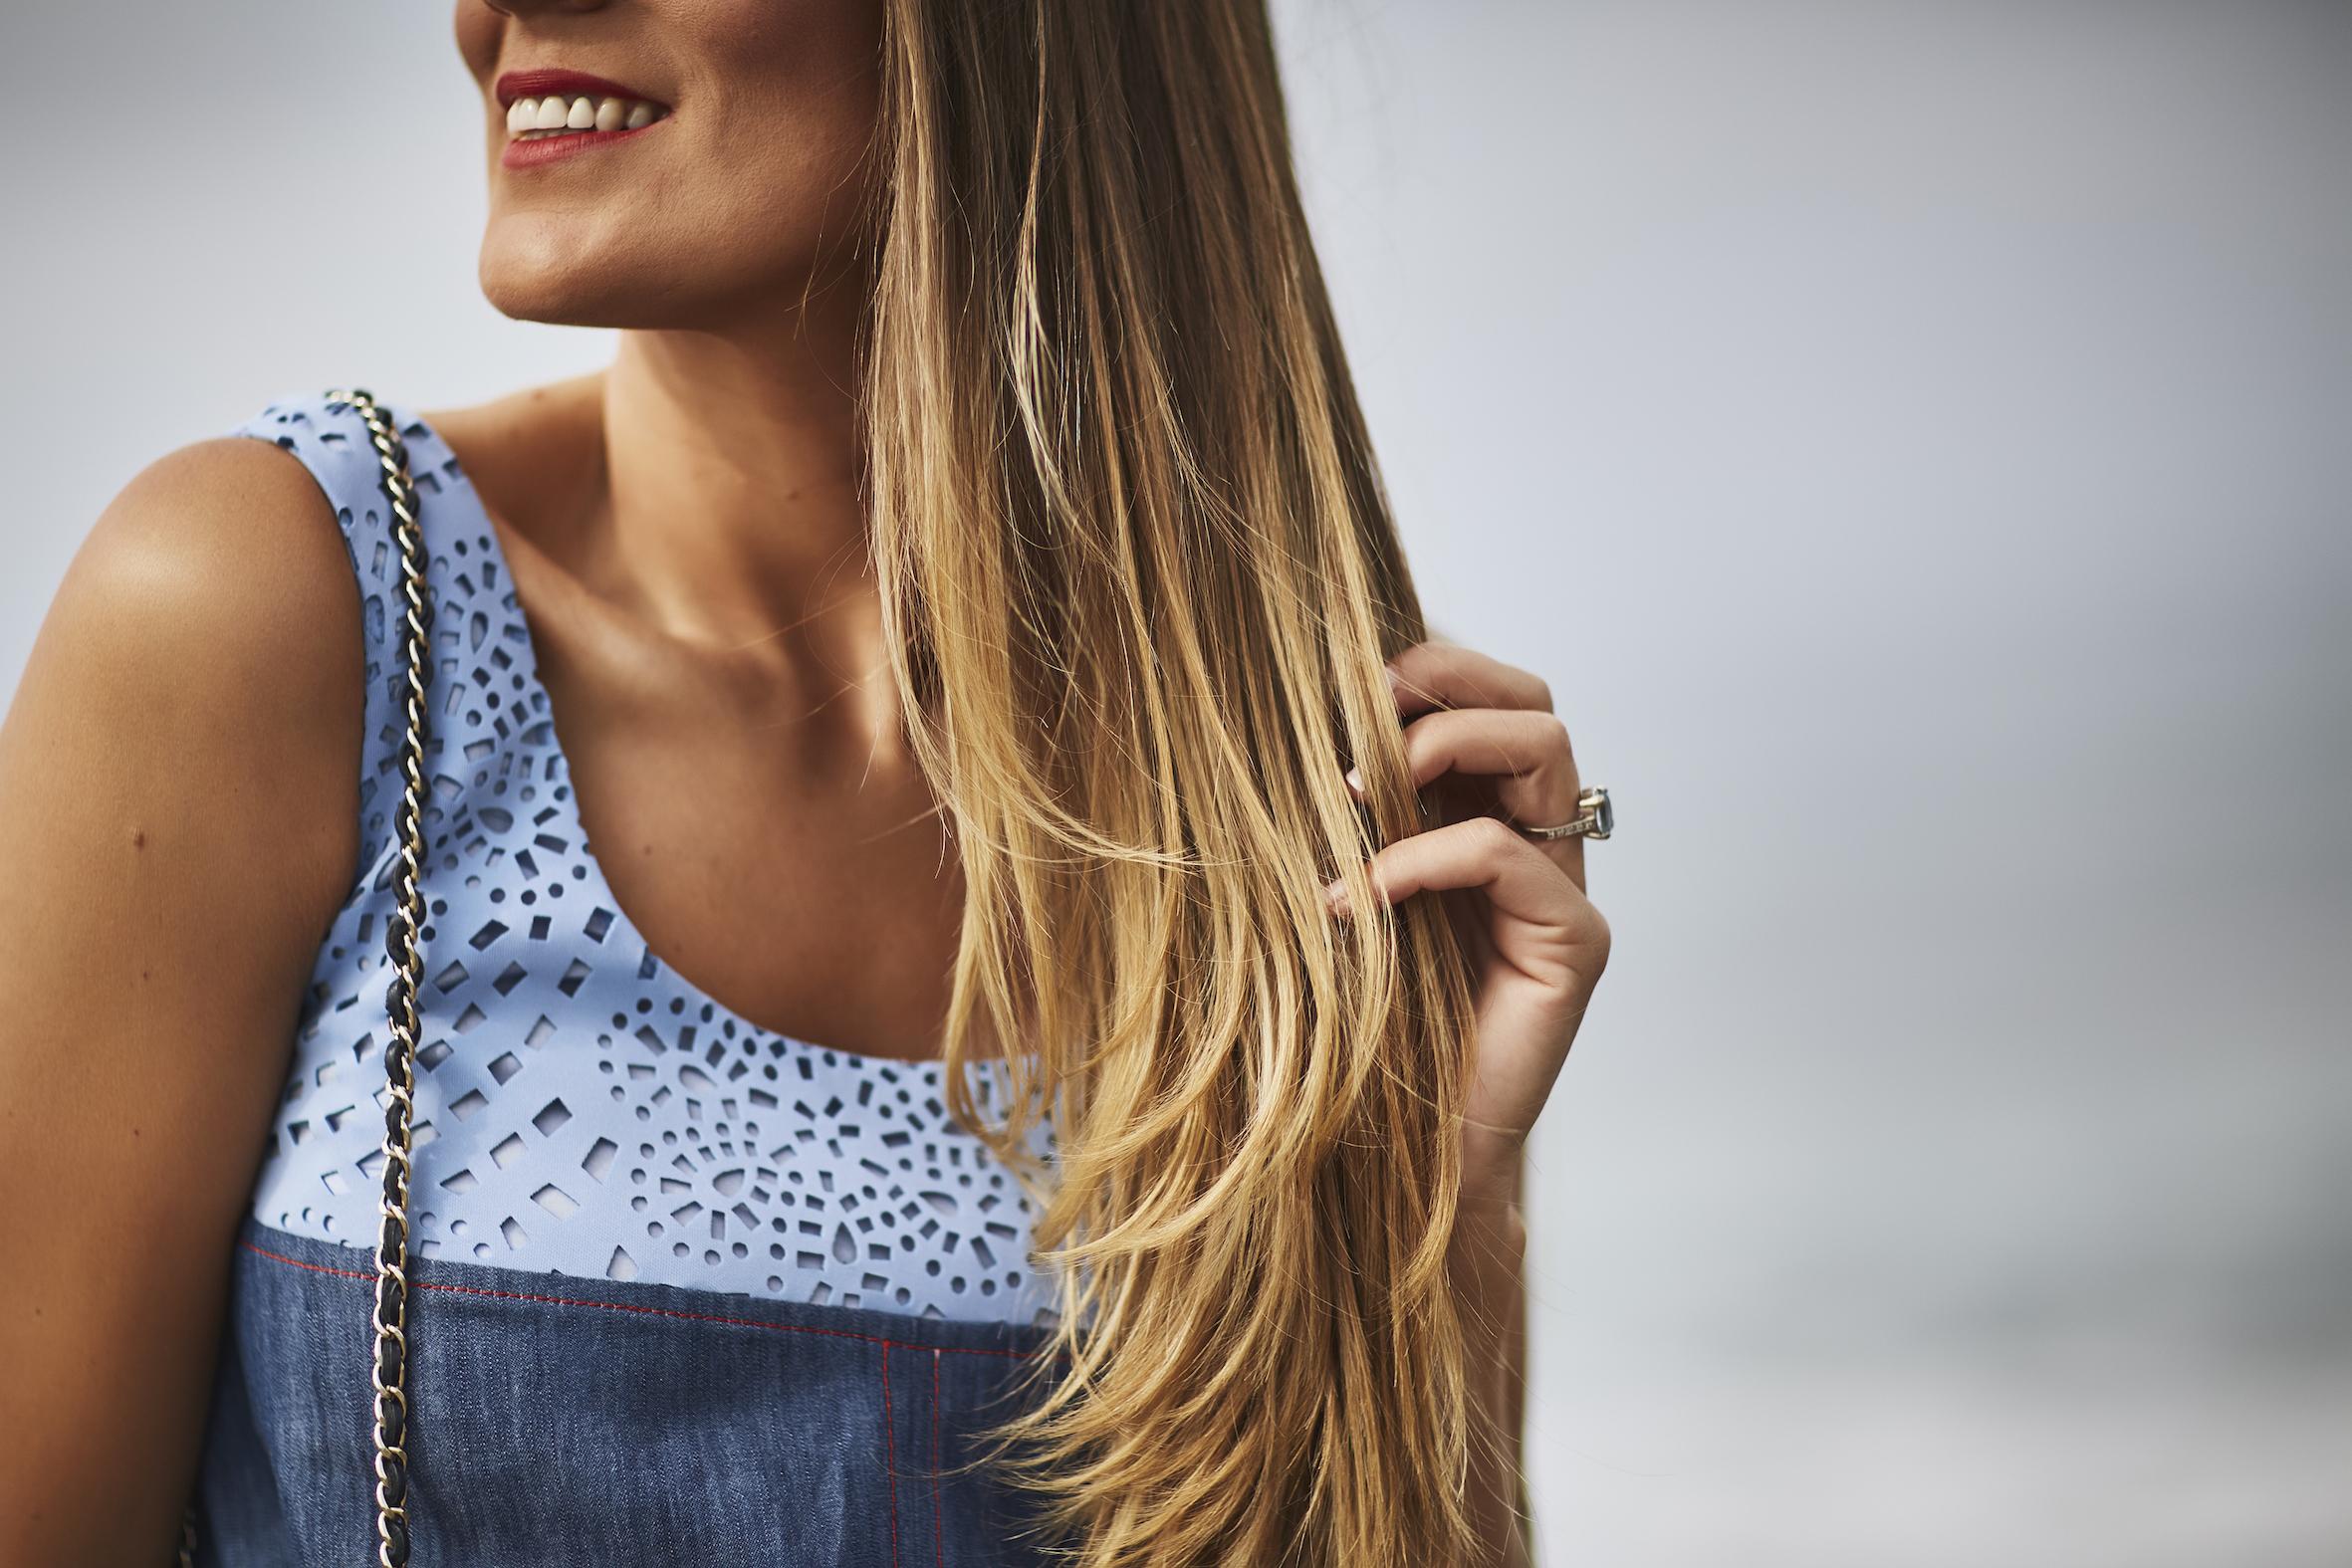 jeans y troquelado by Silvia Godino